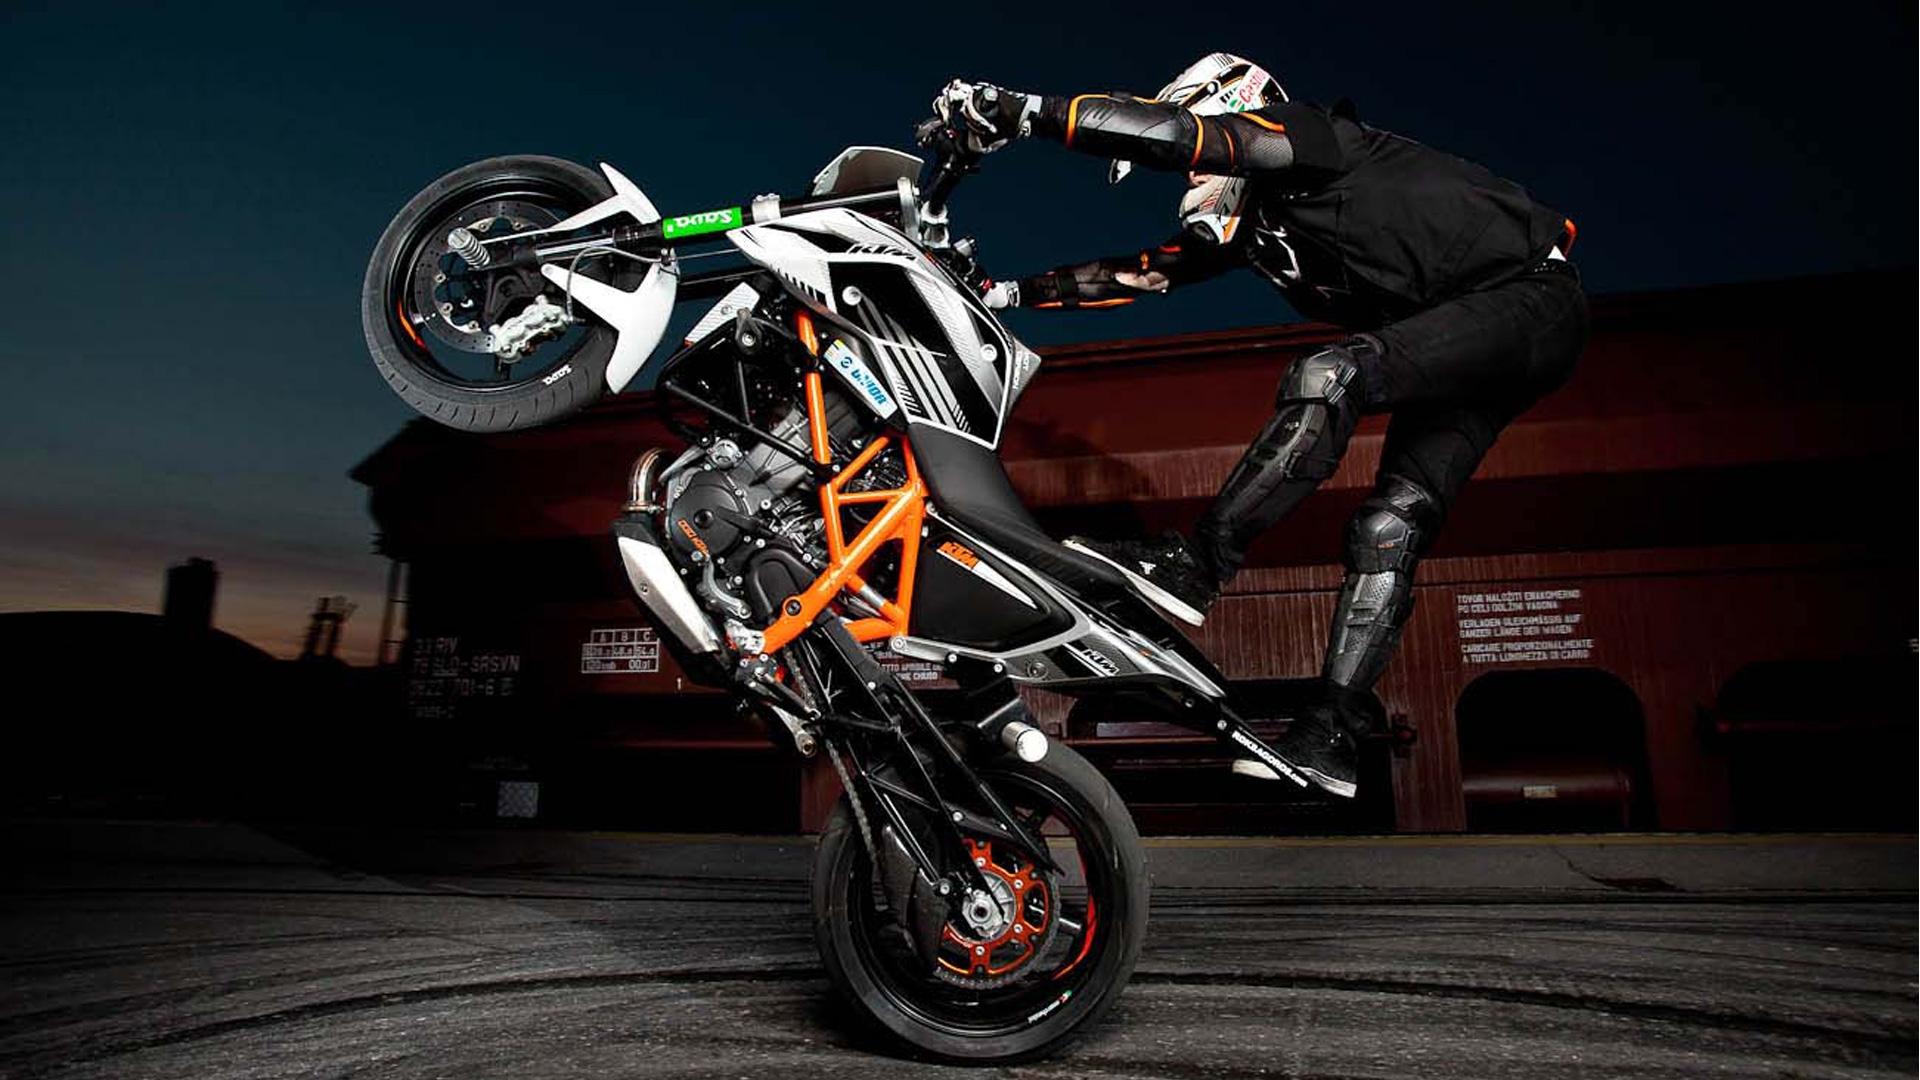 duke bike 1080 hd wallpaper |